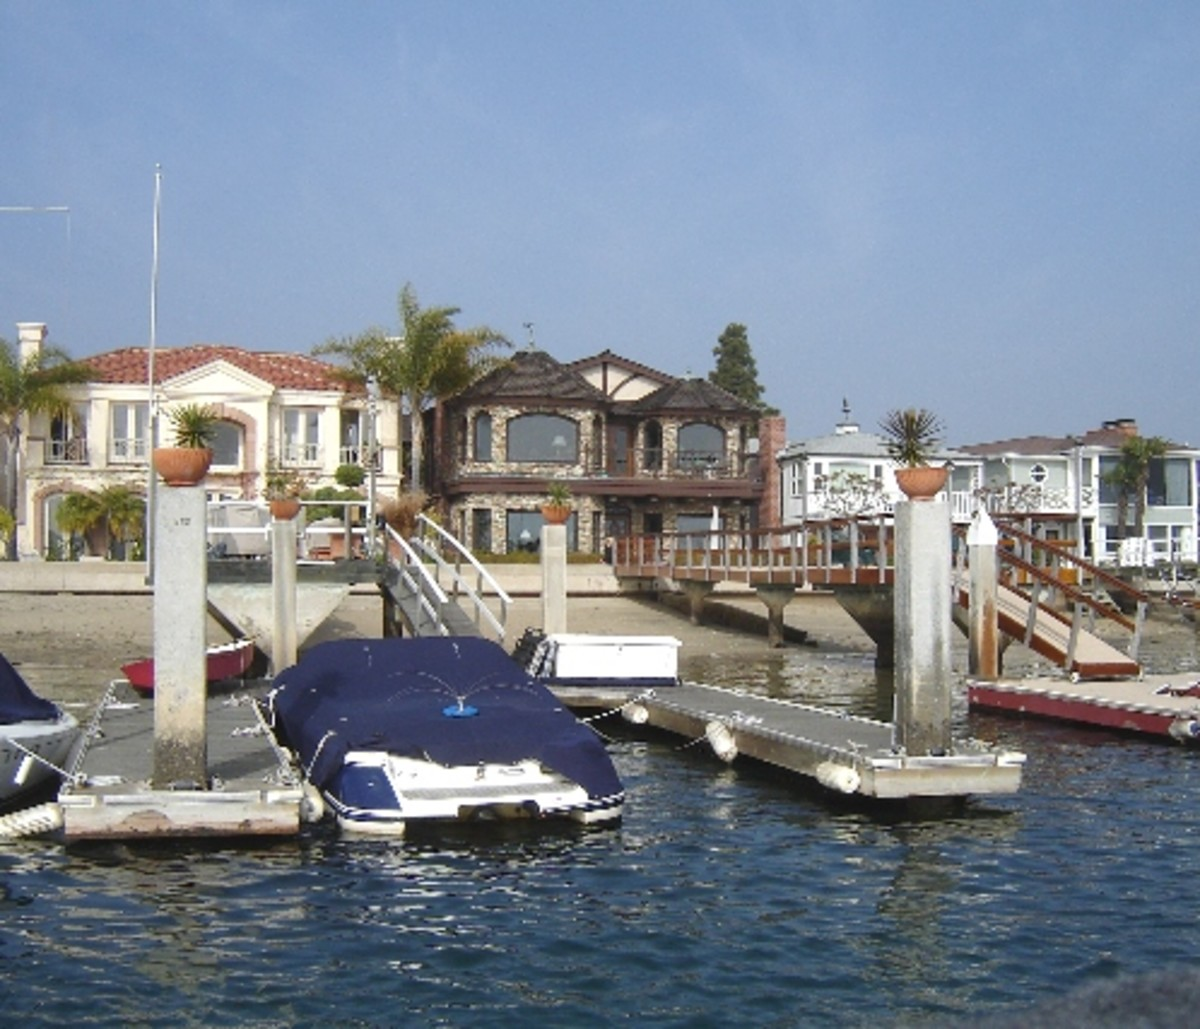 Fun Zone Tour points out houses of celebrities on Balboa Island